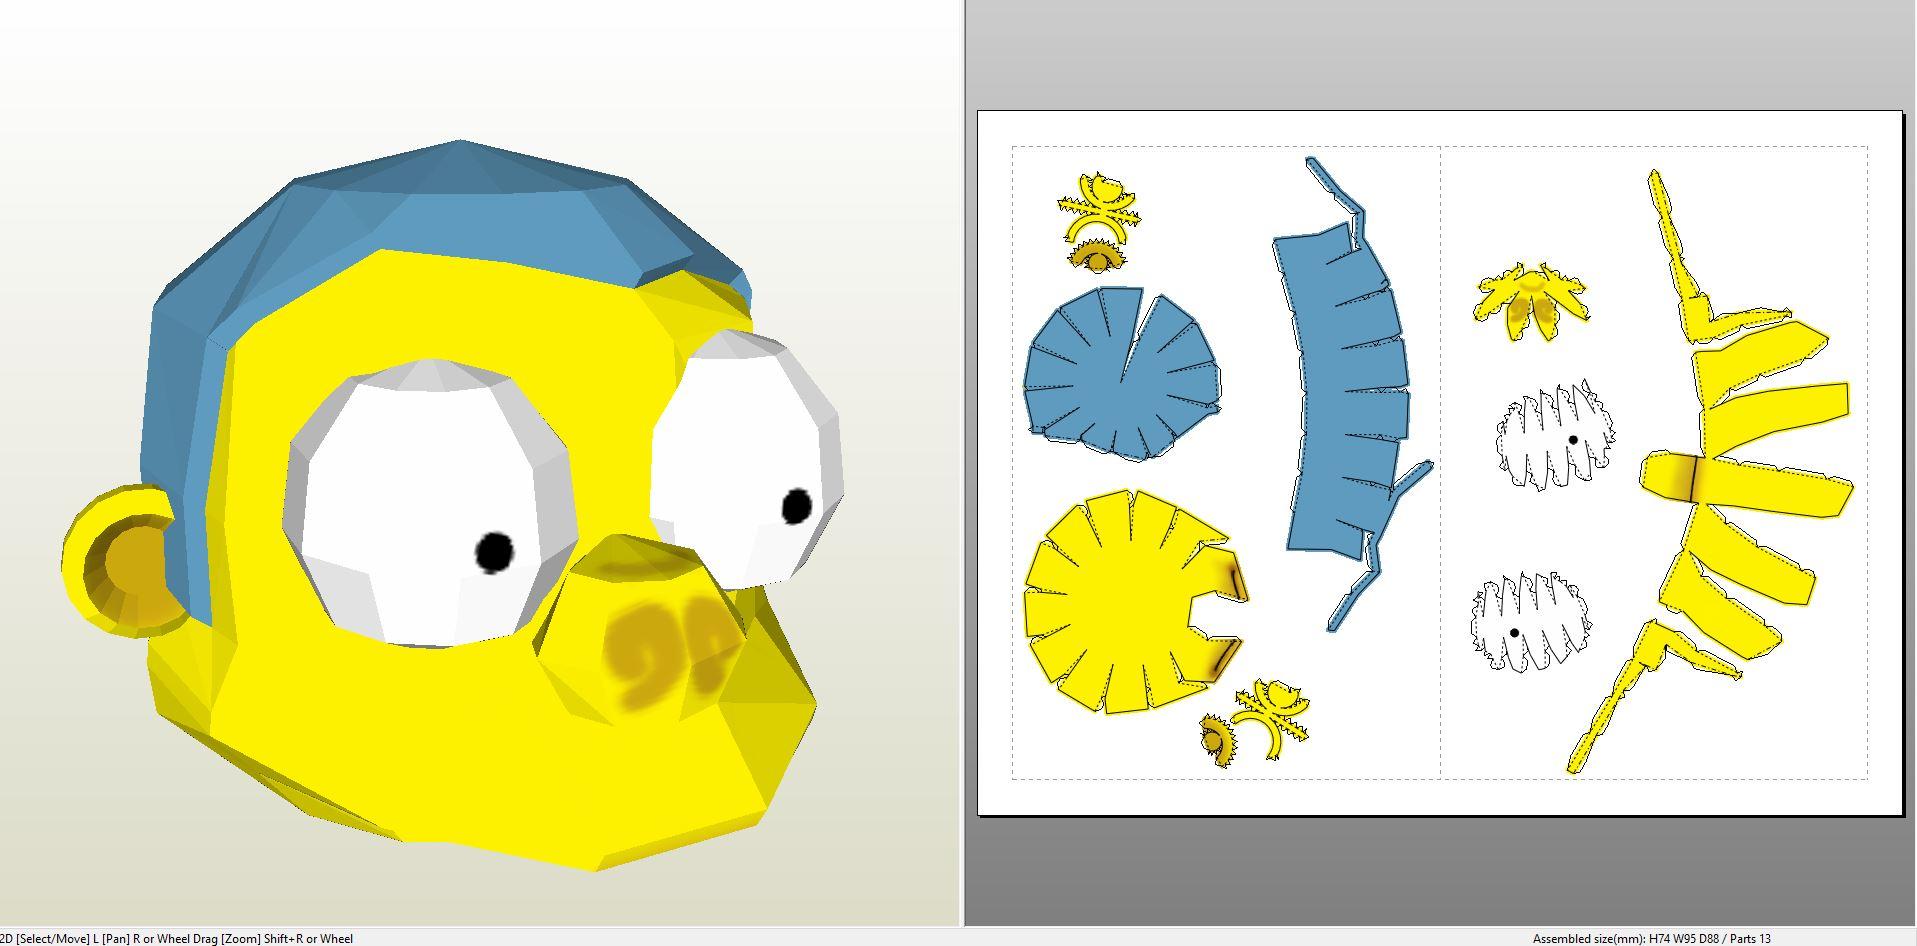 simpsonschiefwiggumhead